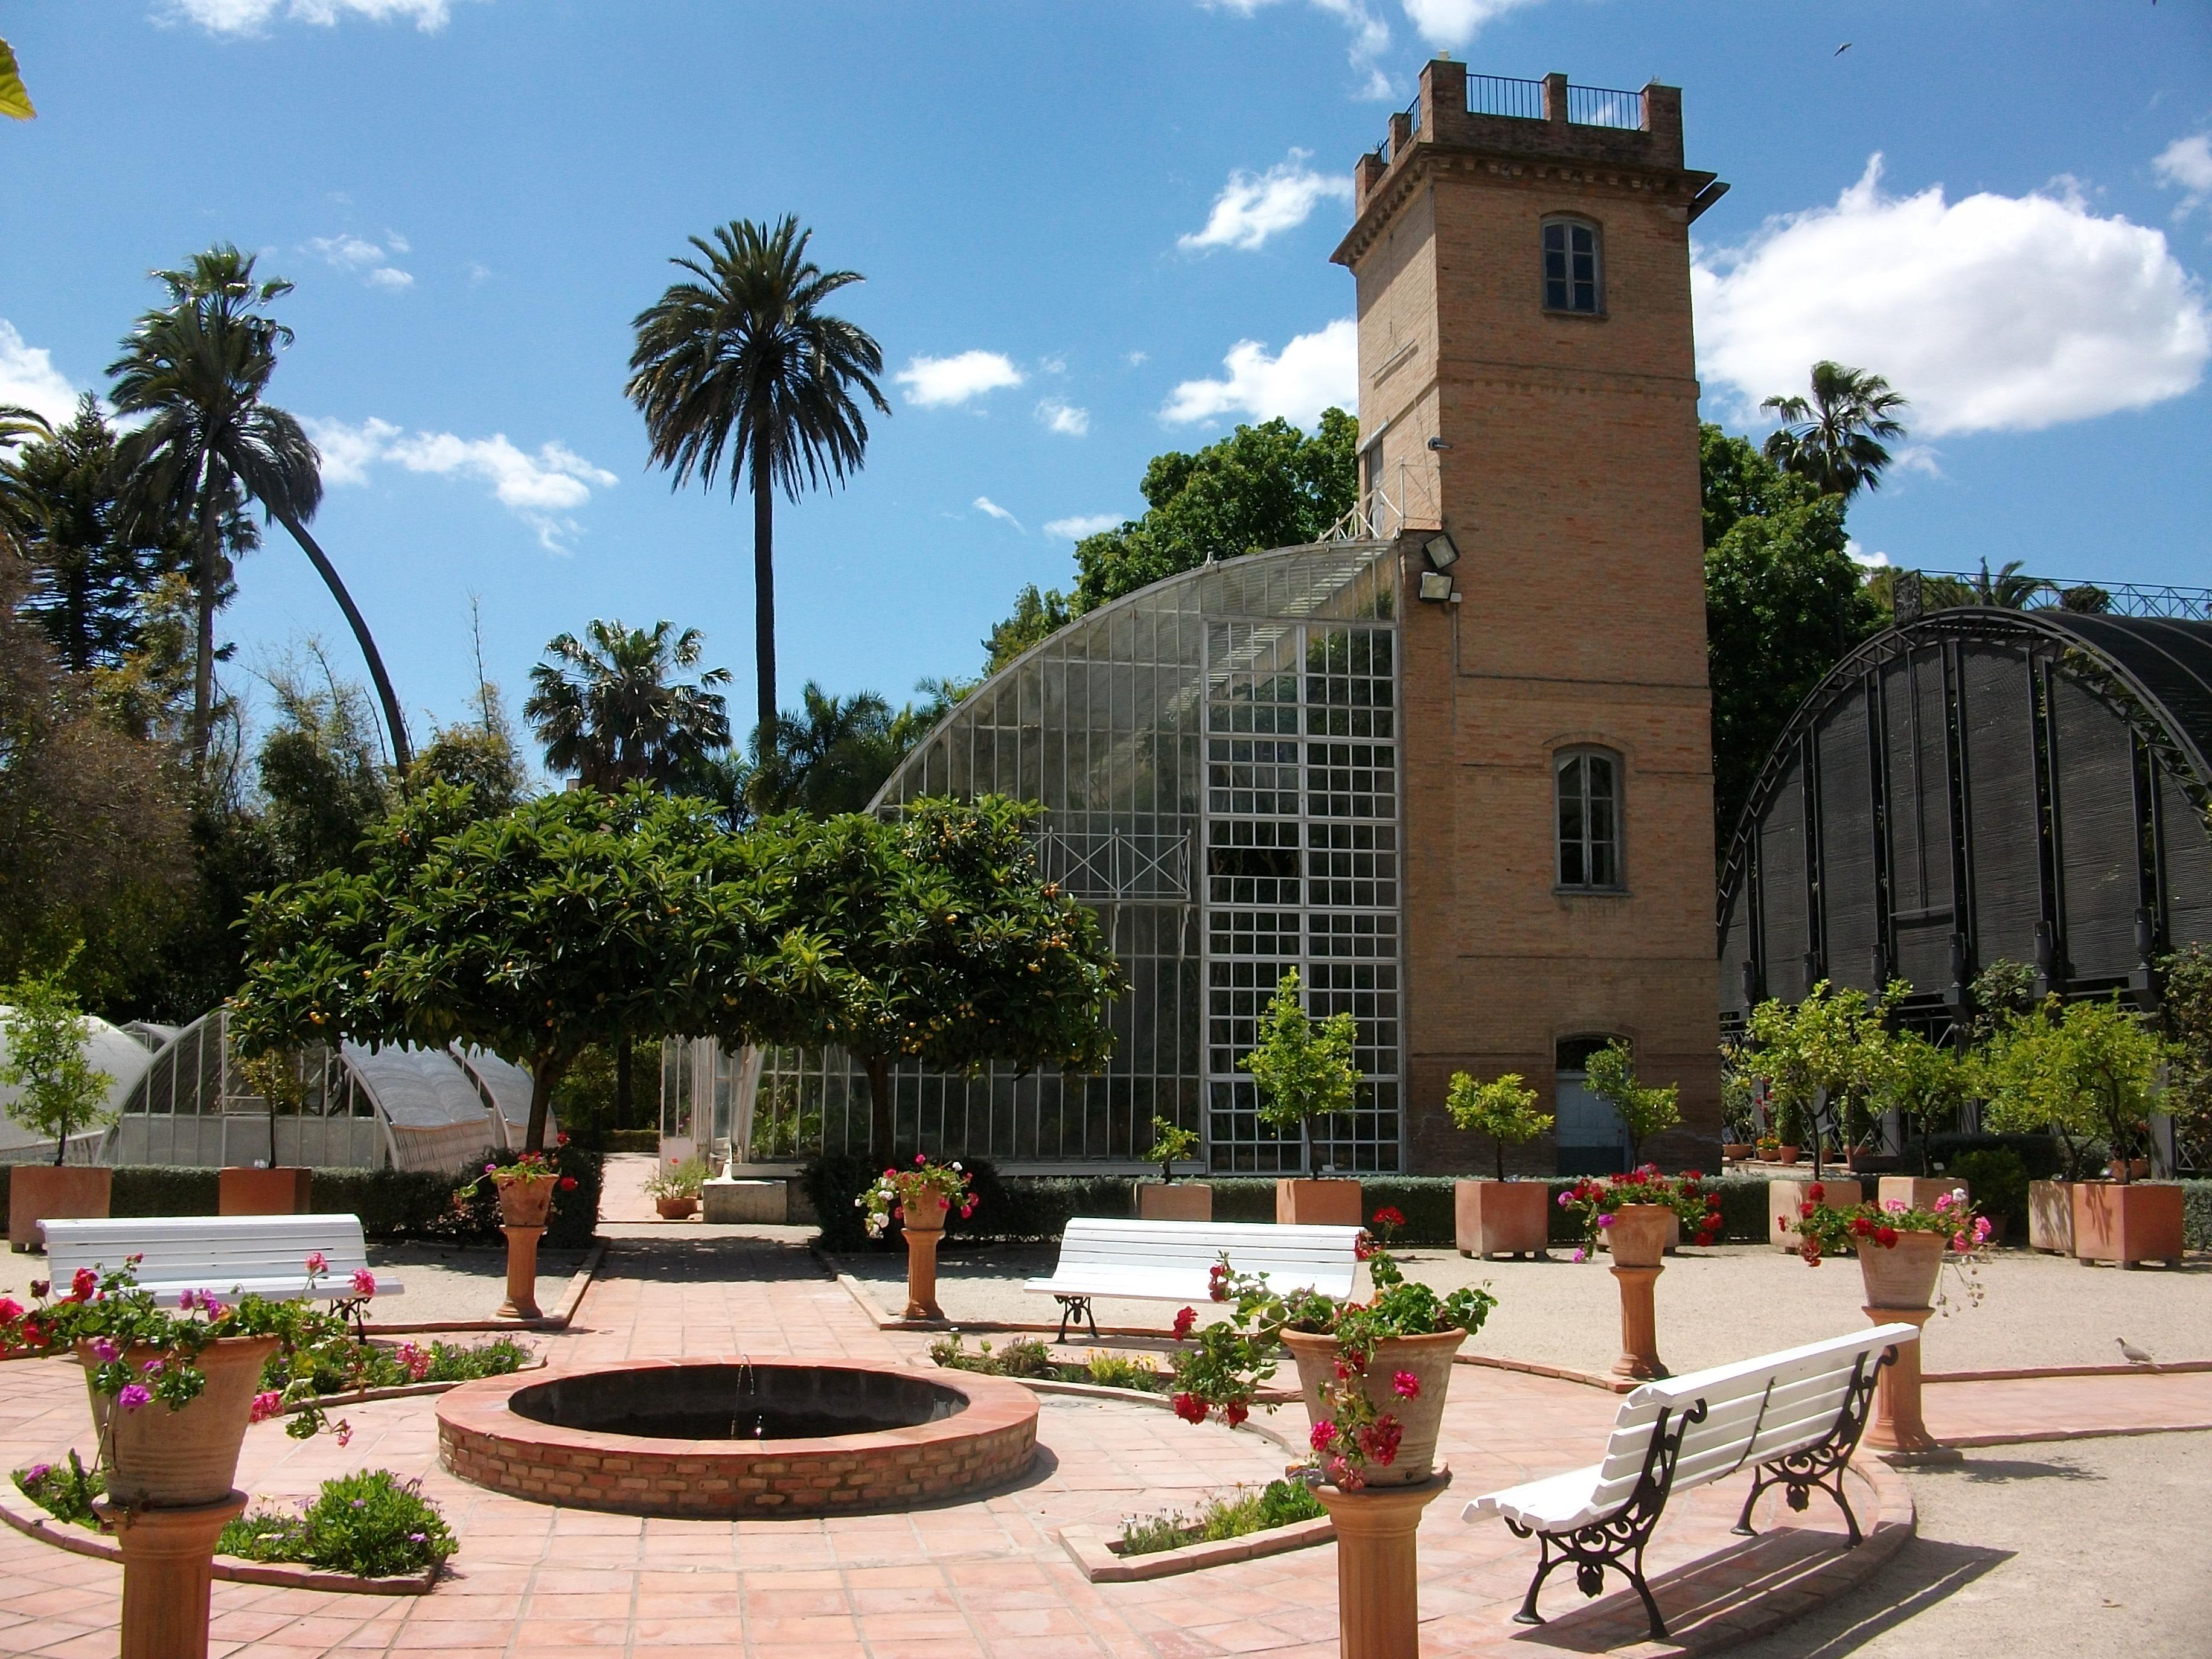 Jardí_Botànic_de_la_Universitat_de_Valéncia